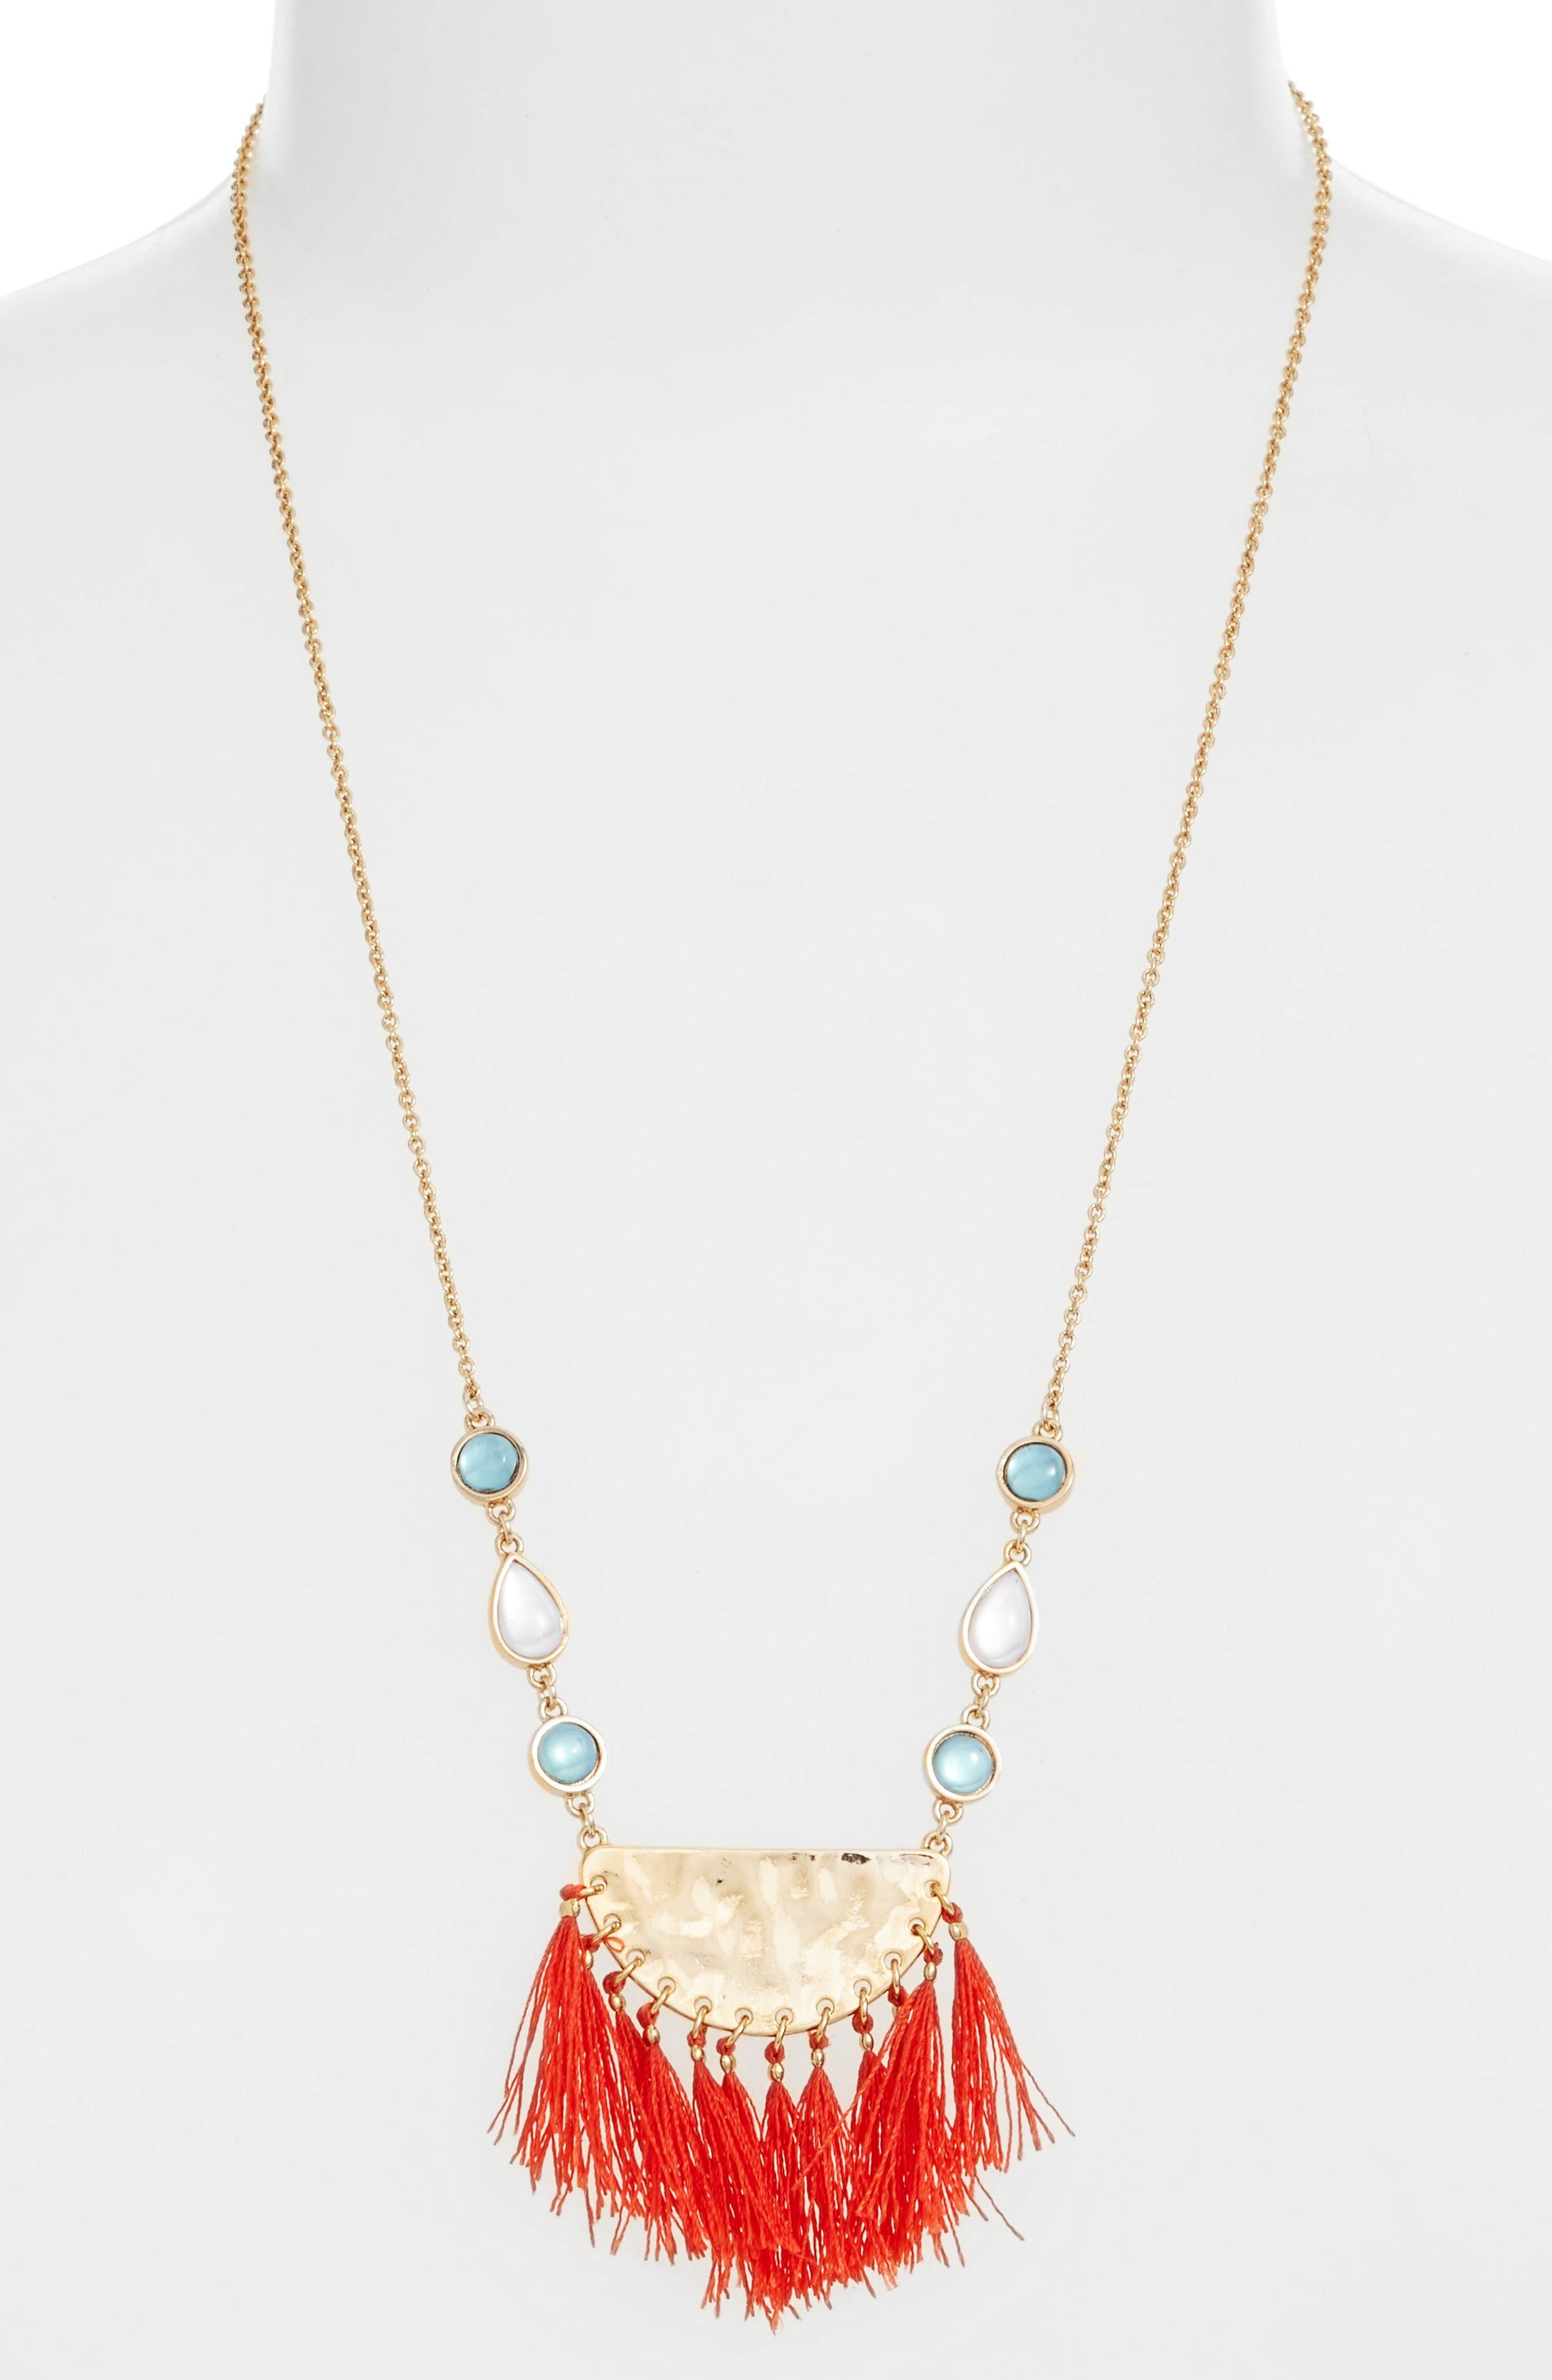 REBECCA MINKOFF Bead & Tassel Pendant Necklace